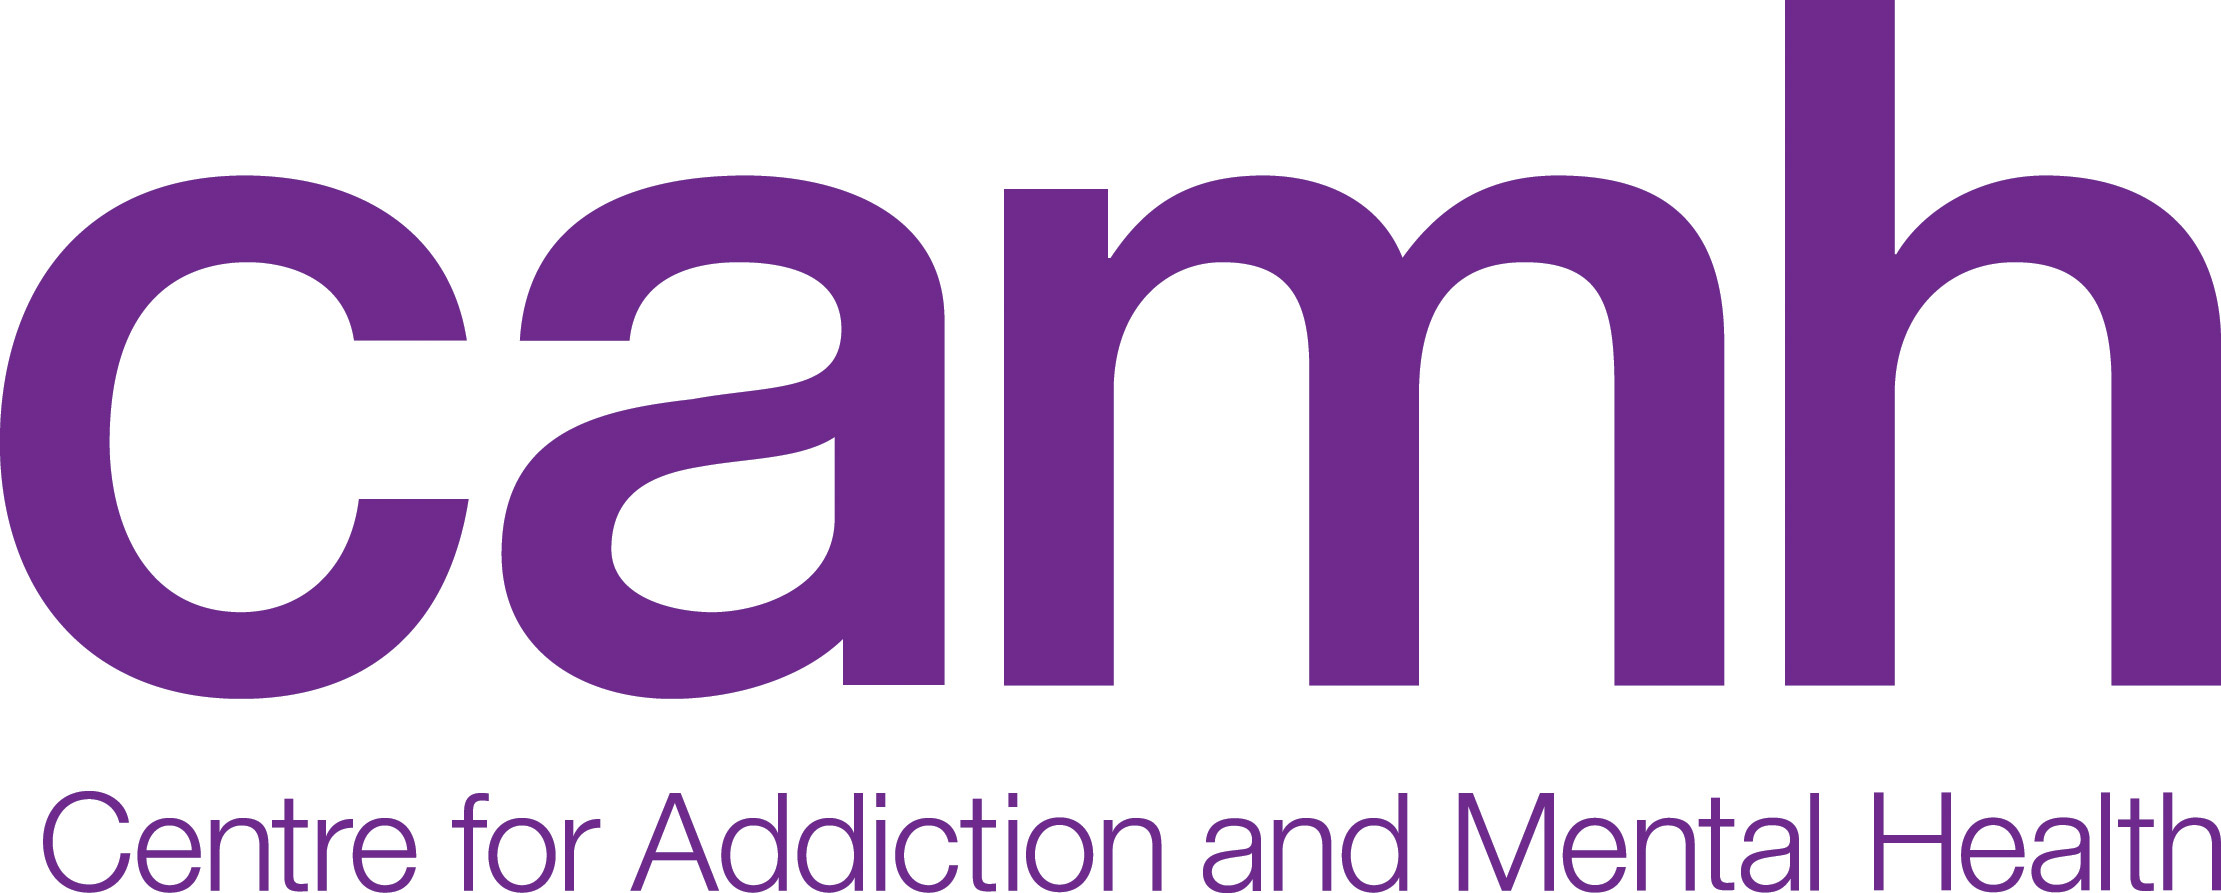 camh_ENGLISH_purple_64998.jpg